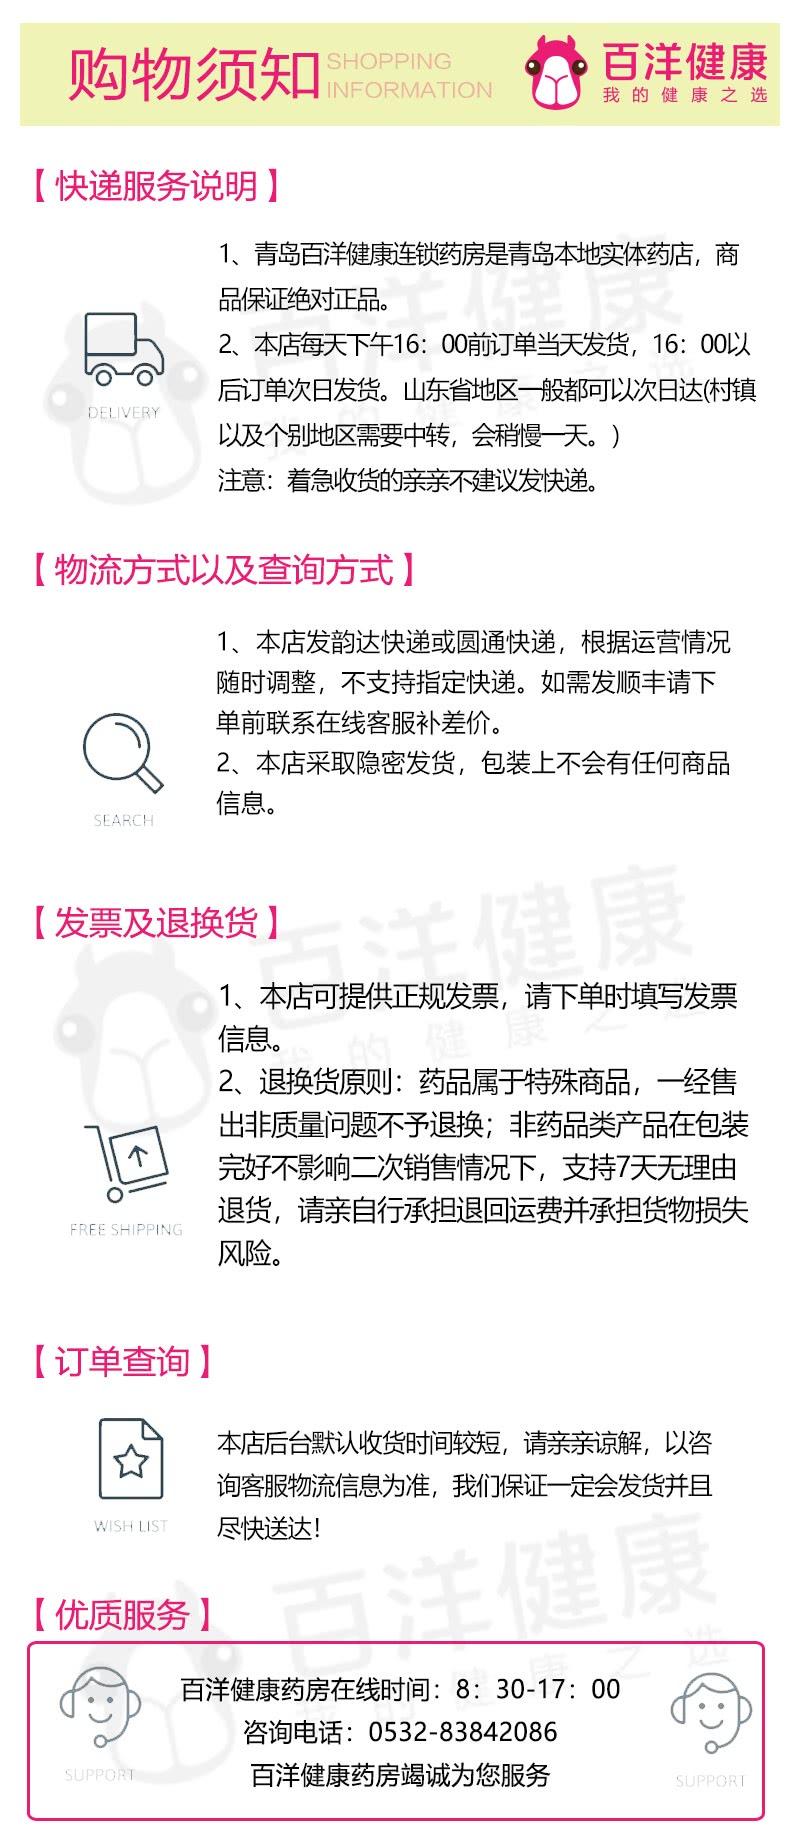 CONBA/康恩贝 肠炎宁片 0.42g*24片/盒 拉肚子药 腹泻